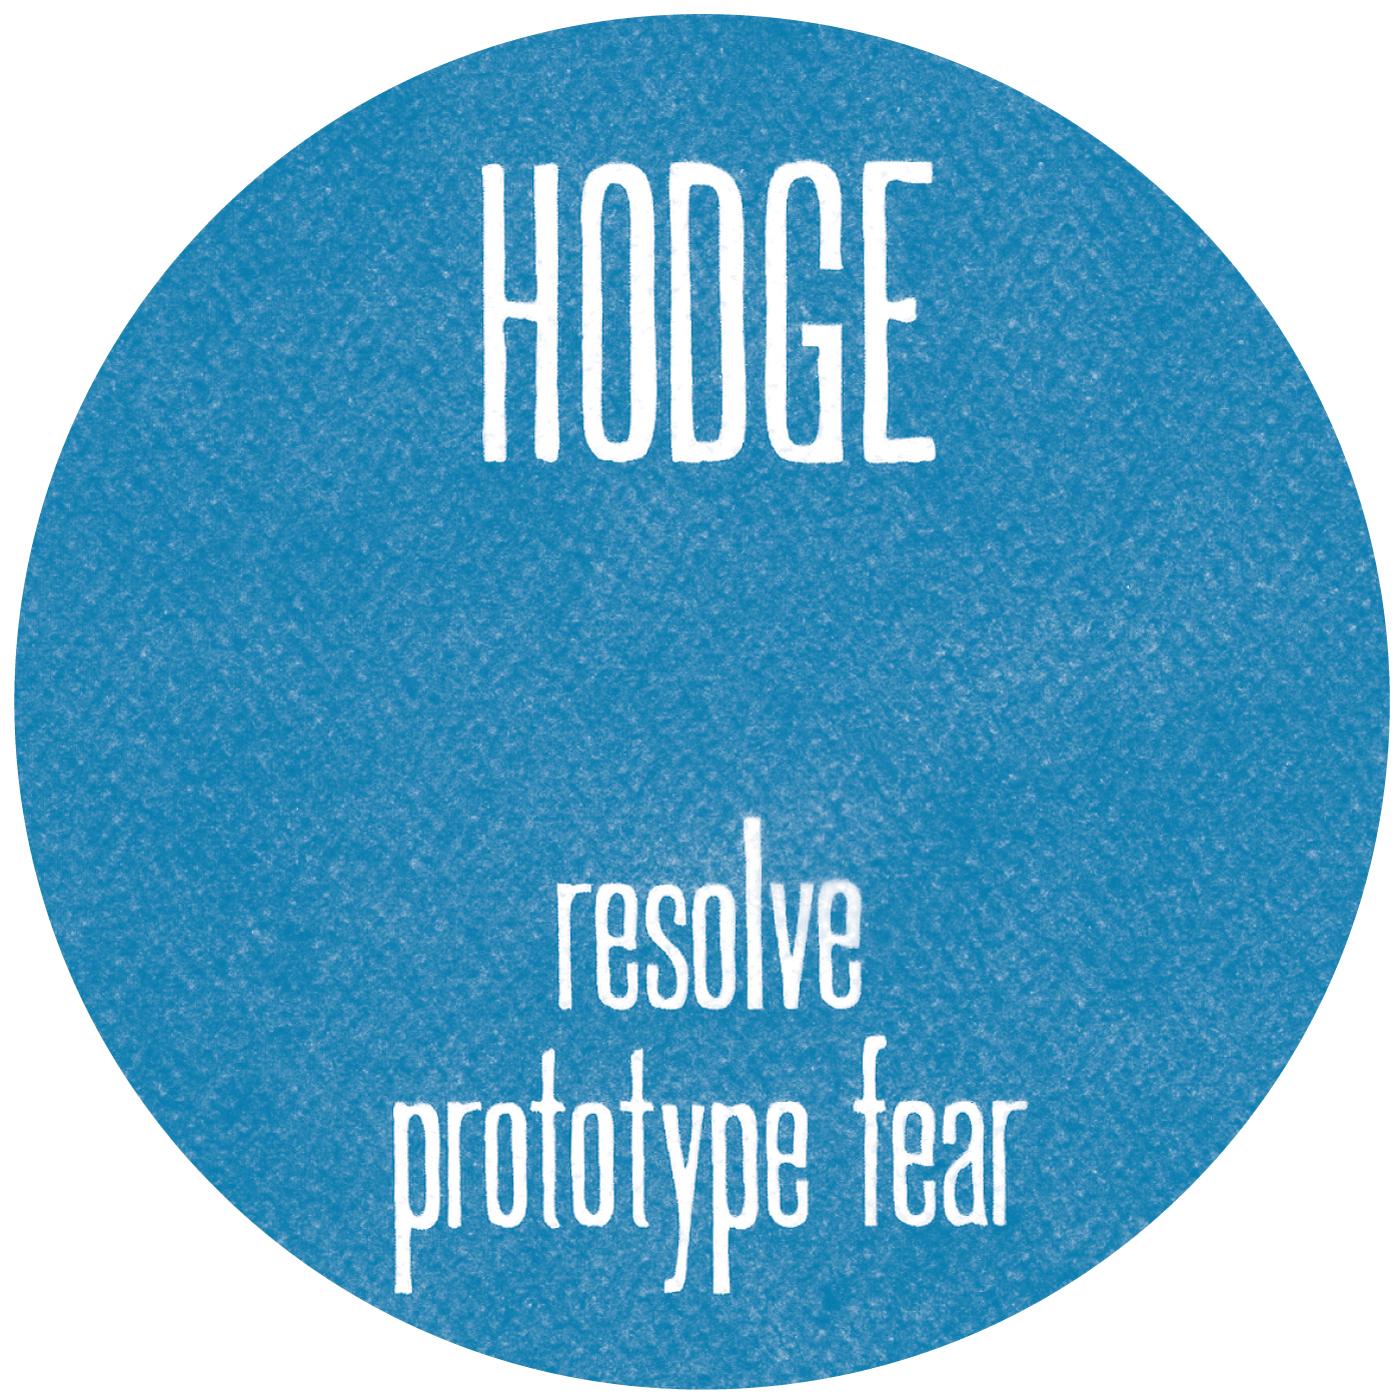 "Hodge/RESOLVE & PROTOTYPE FEAR 12"""